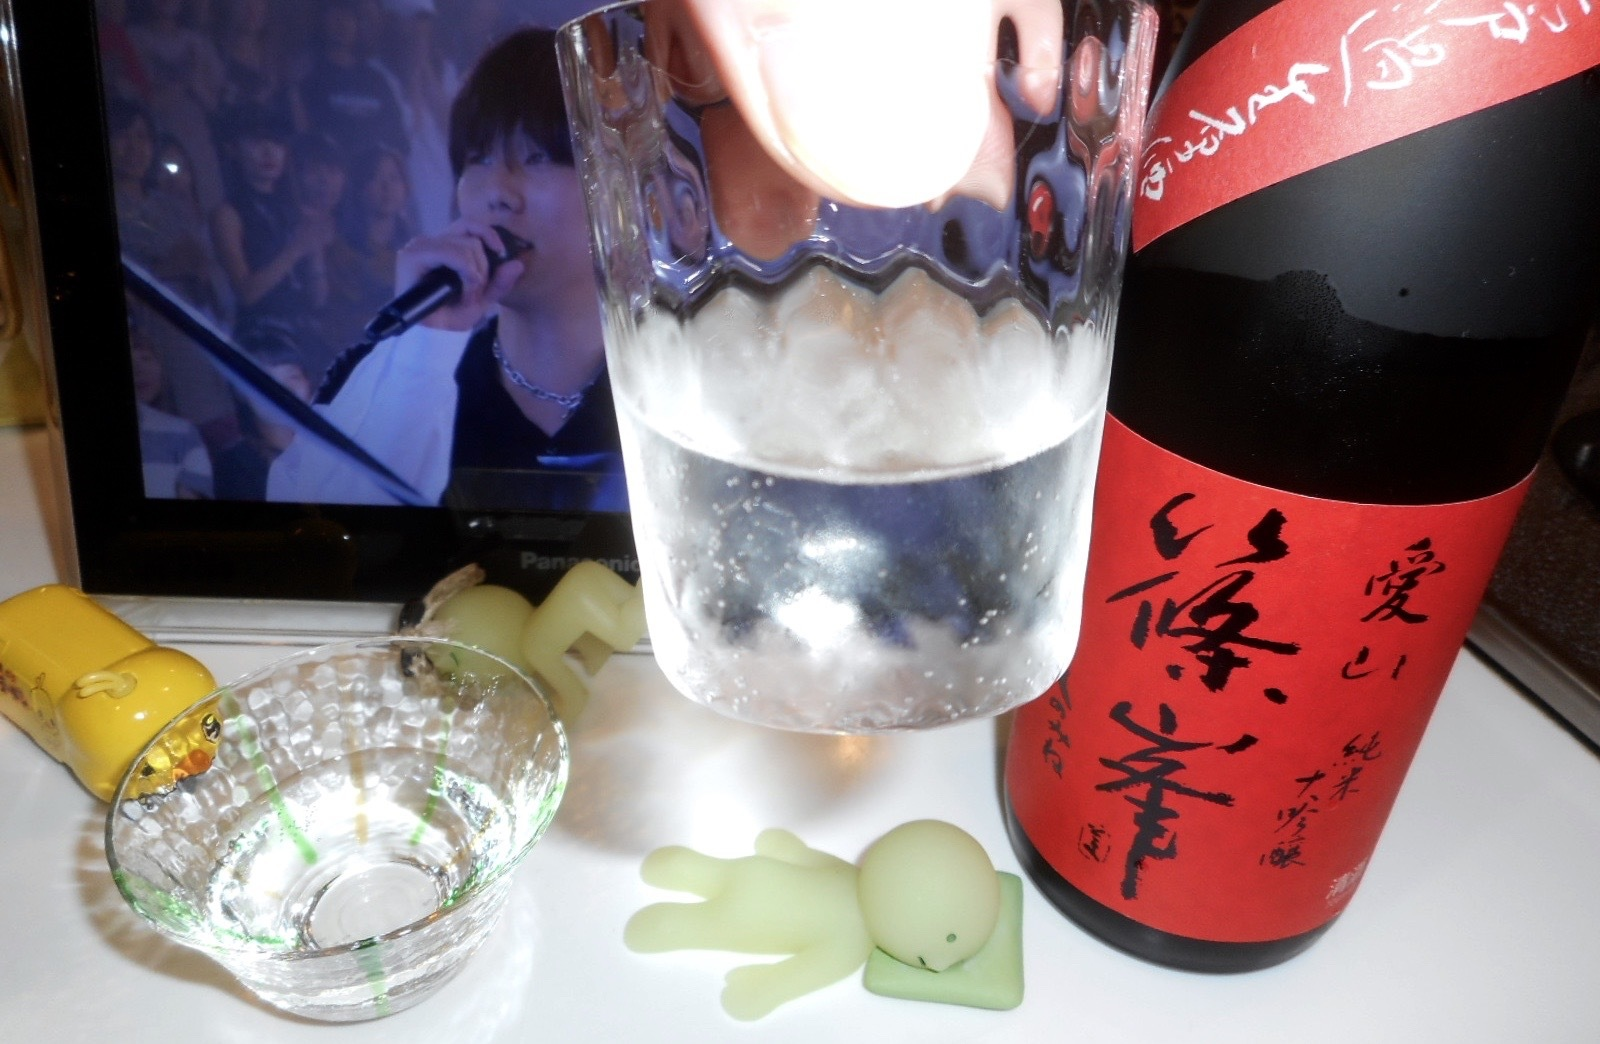 shinomine_aiyama45_29by3_5.jpg